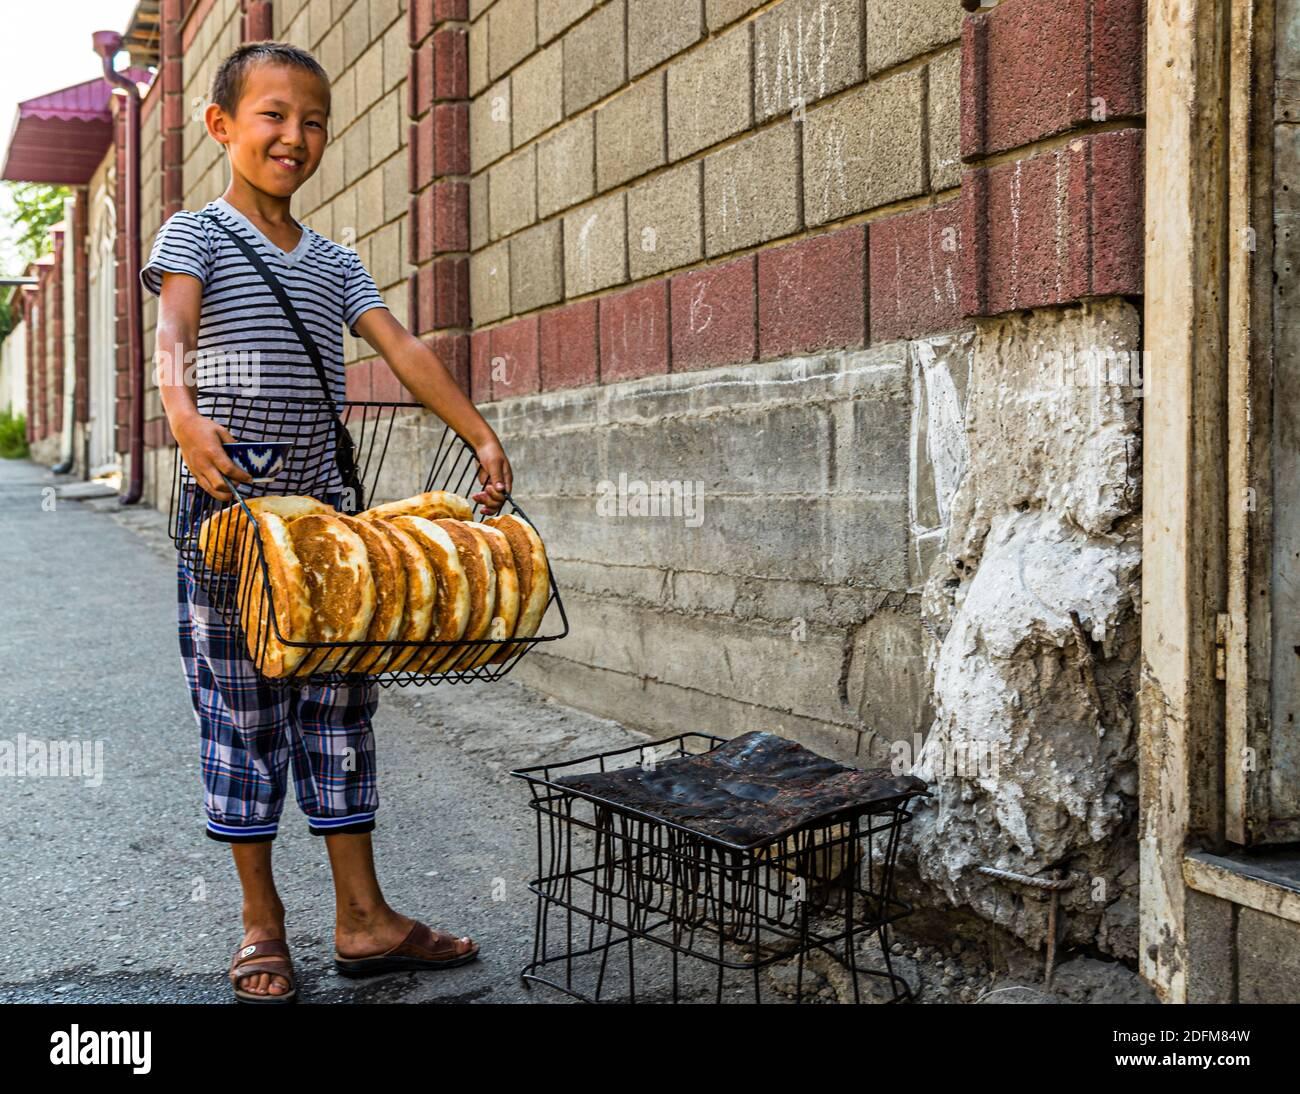 Fresh round Bread Tajik Non (Naan). Artisan Bread Bakery in the City of Osh, Kyrgyzstan Stock Photo